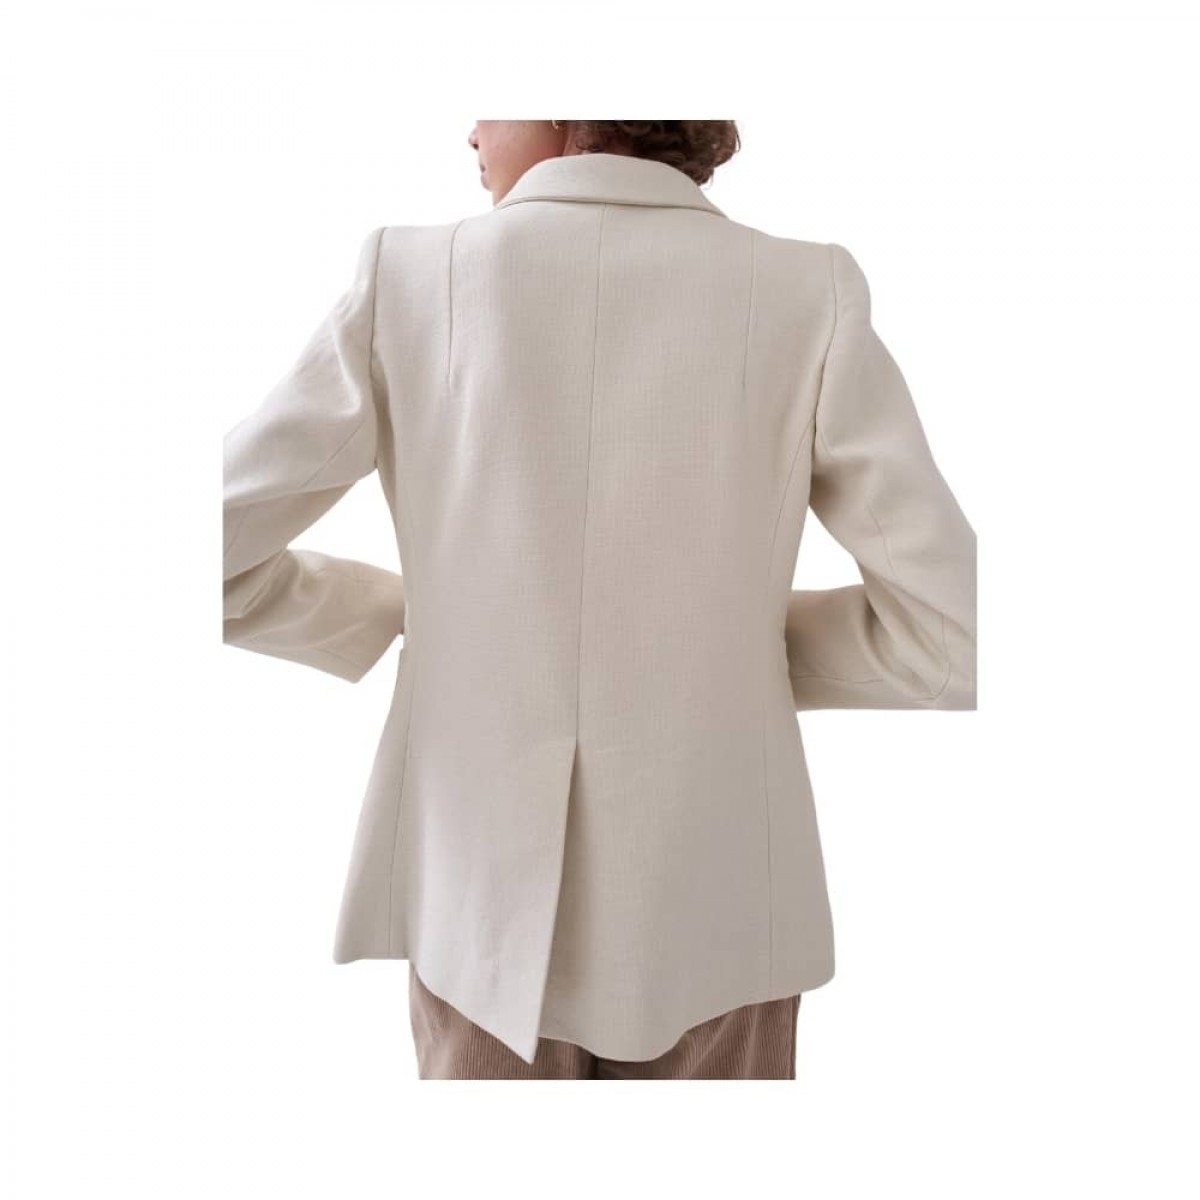 c. rampling jacket - cream - ryggen